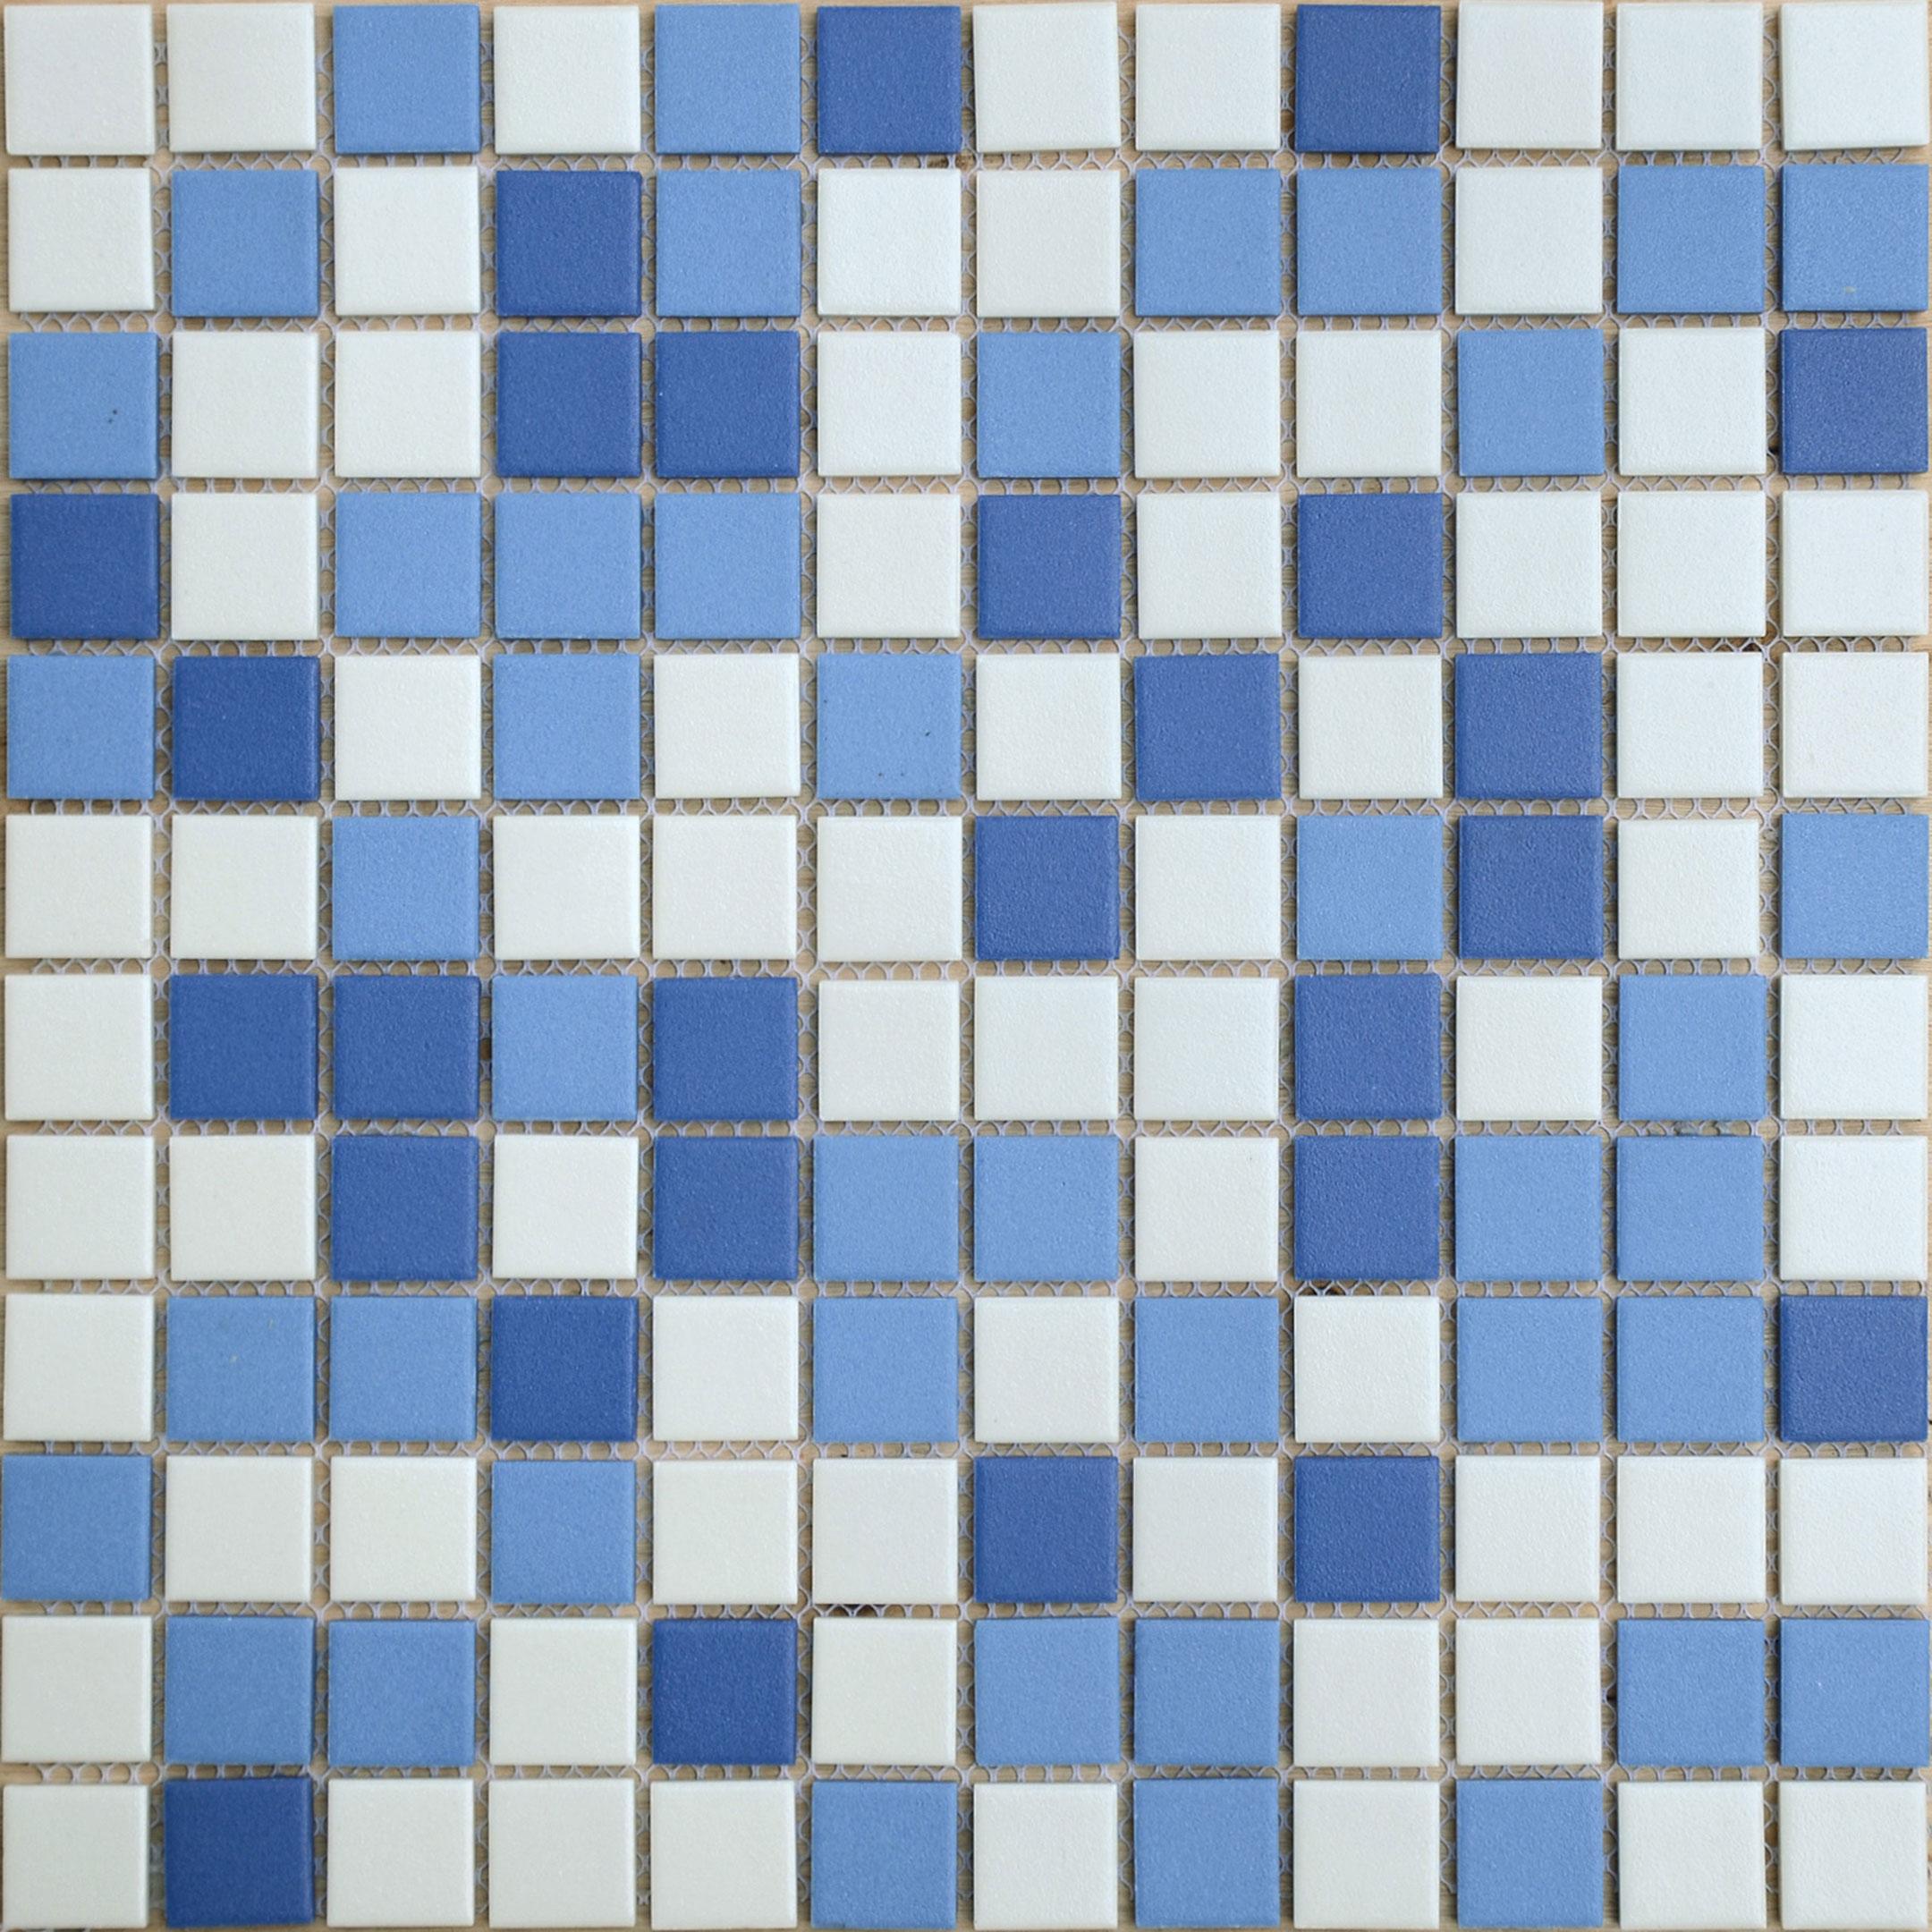 Мозаика Caramelle Nettuno микс синий из керамогранита 300х300х6 мм